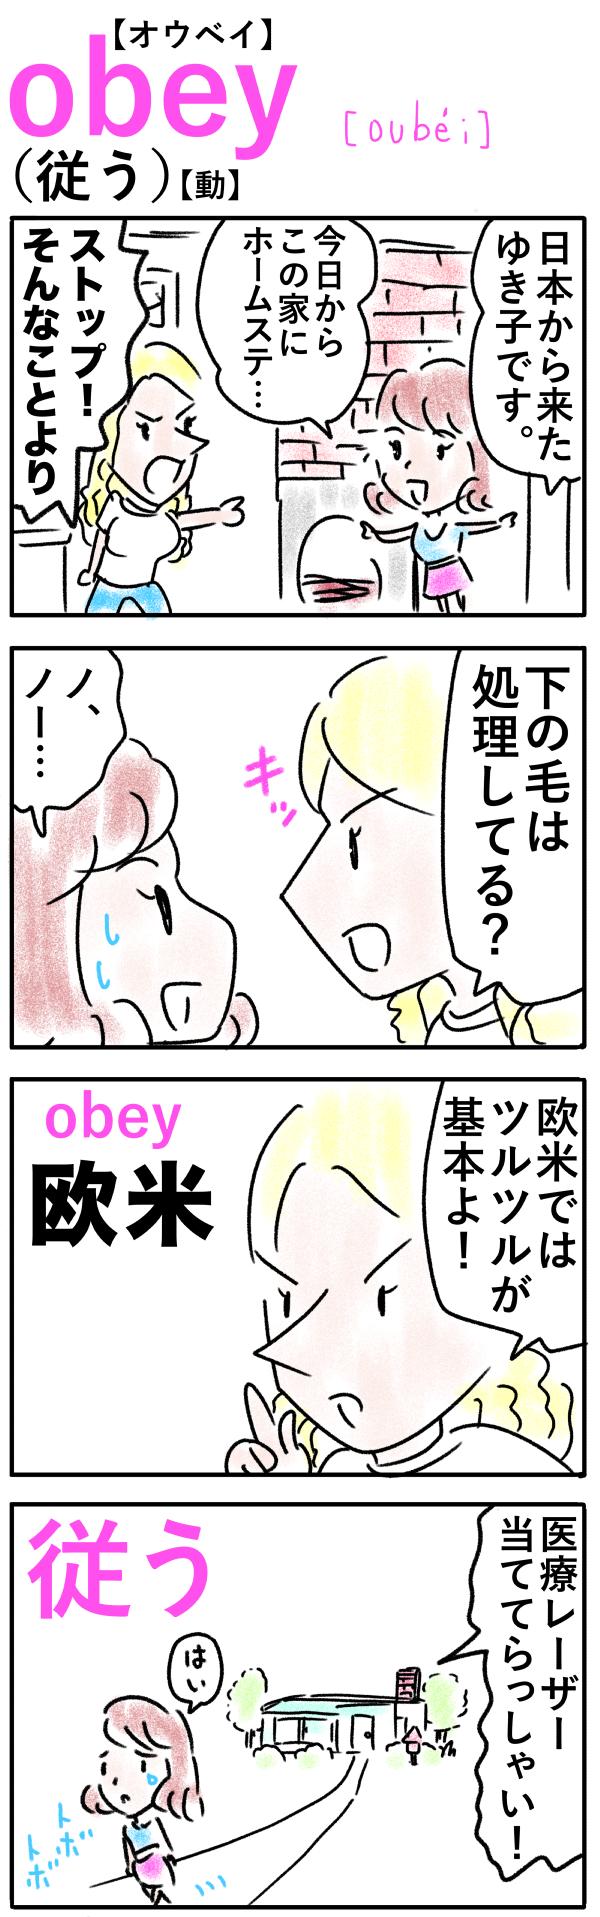 obey(従う)の語呂合わせ英単語